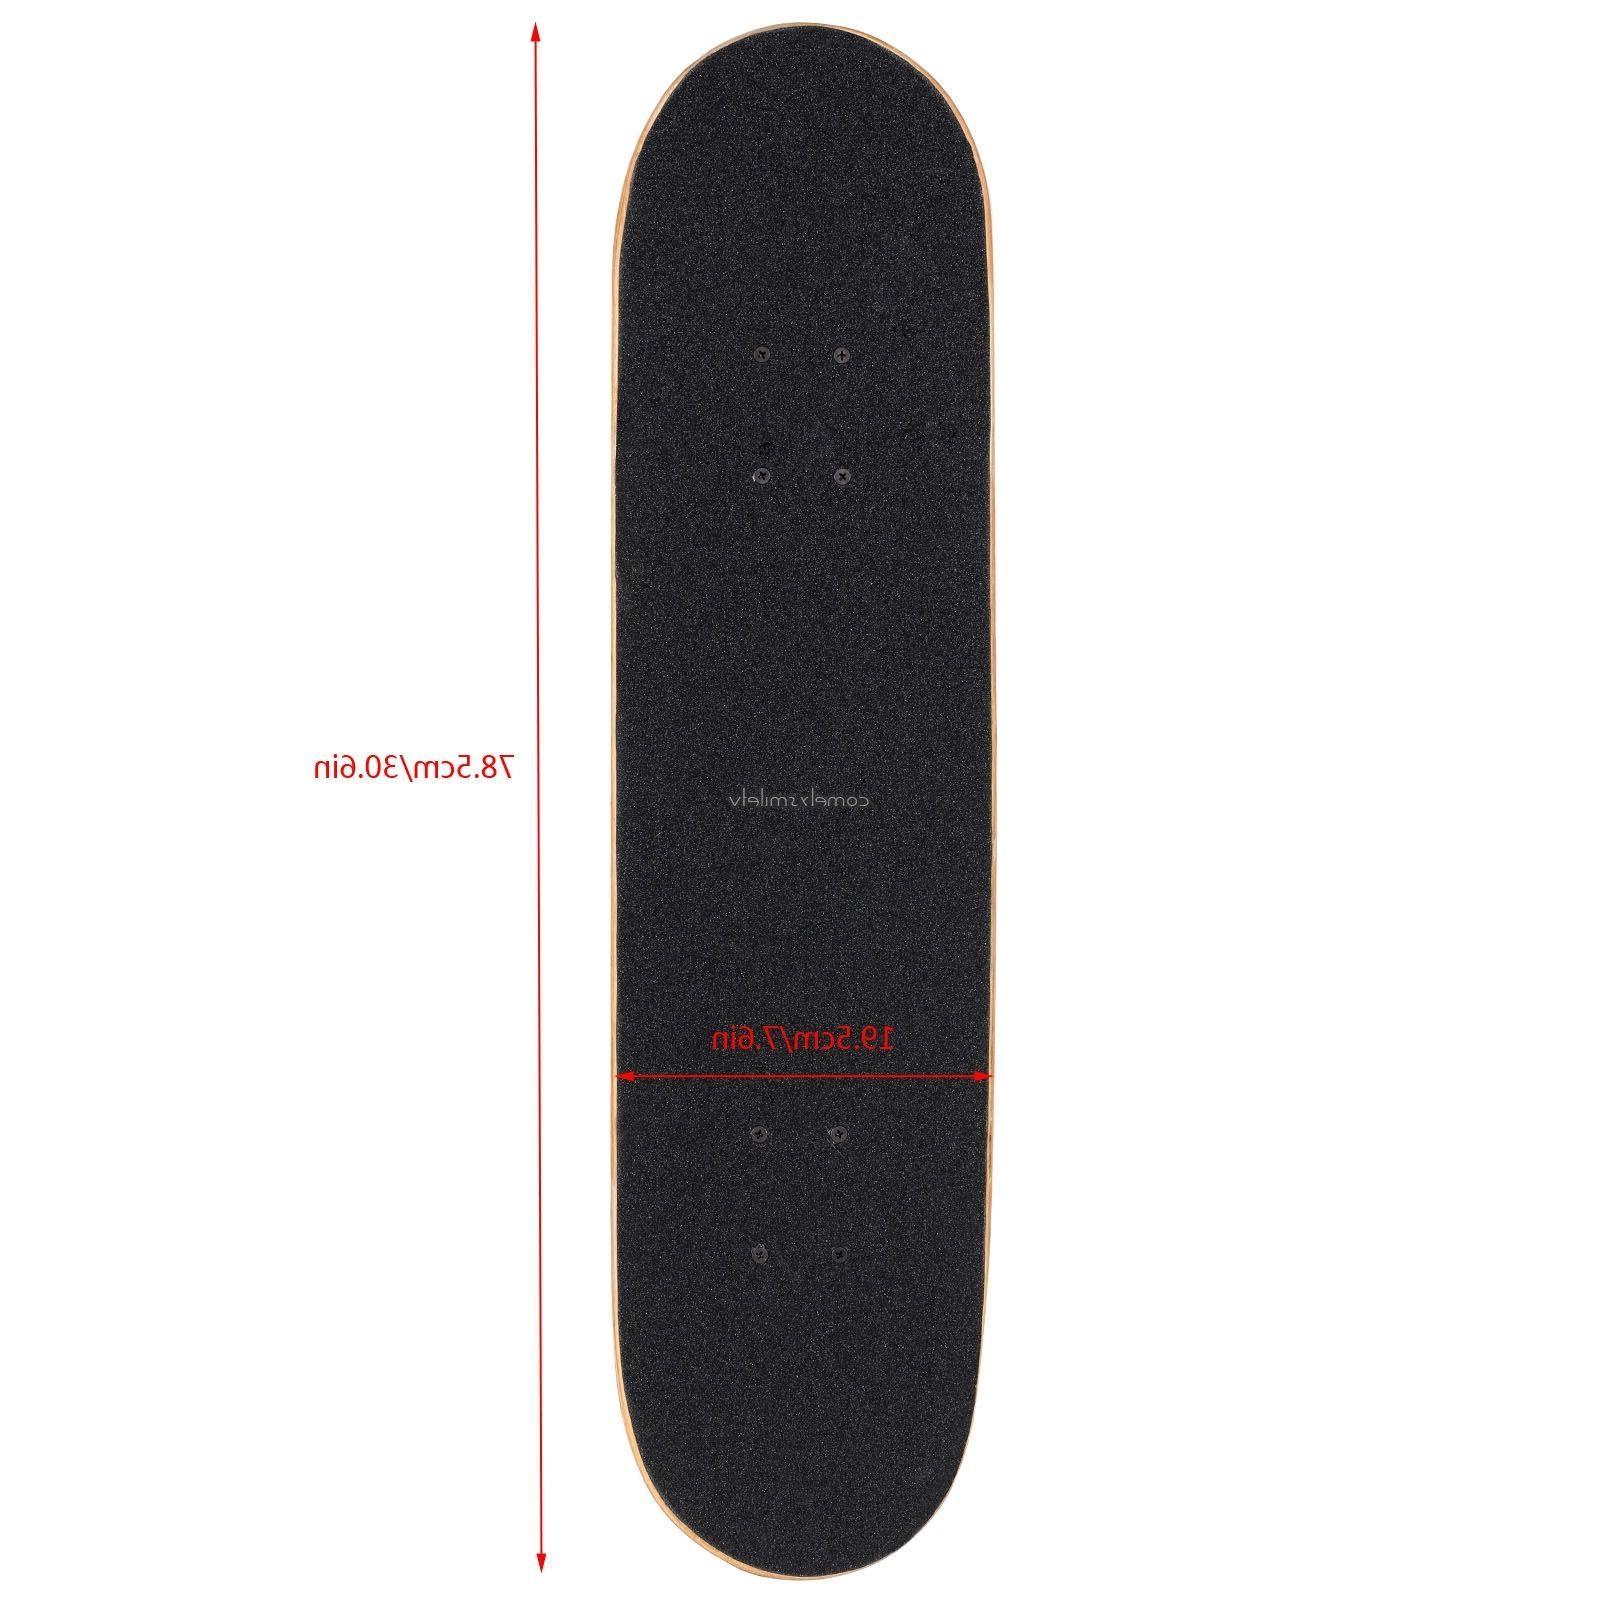 Kick Scooter Complete Skate Longboarding